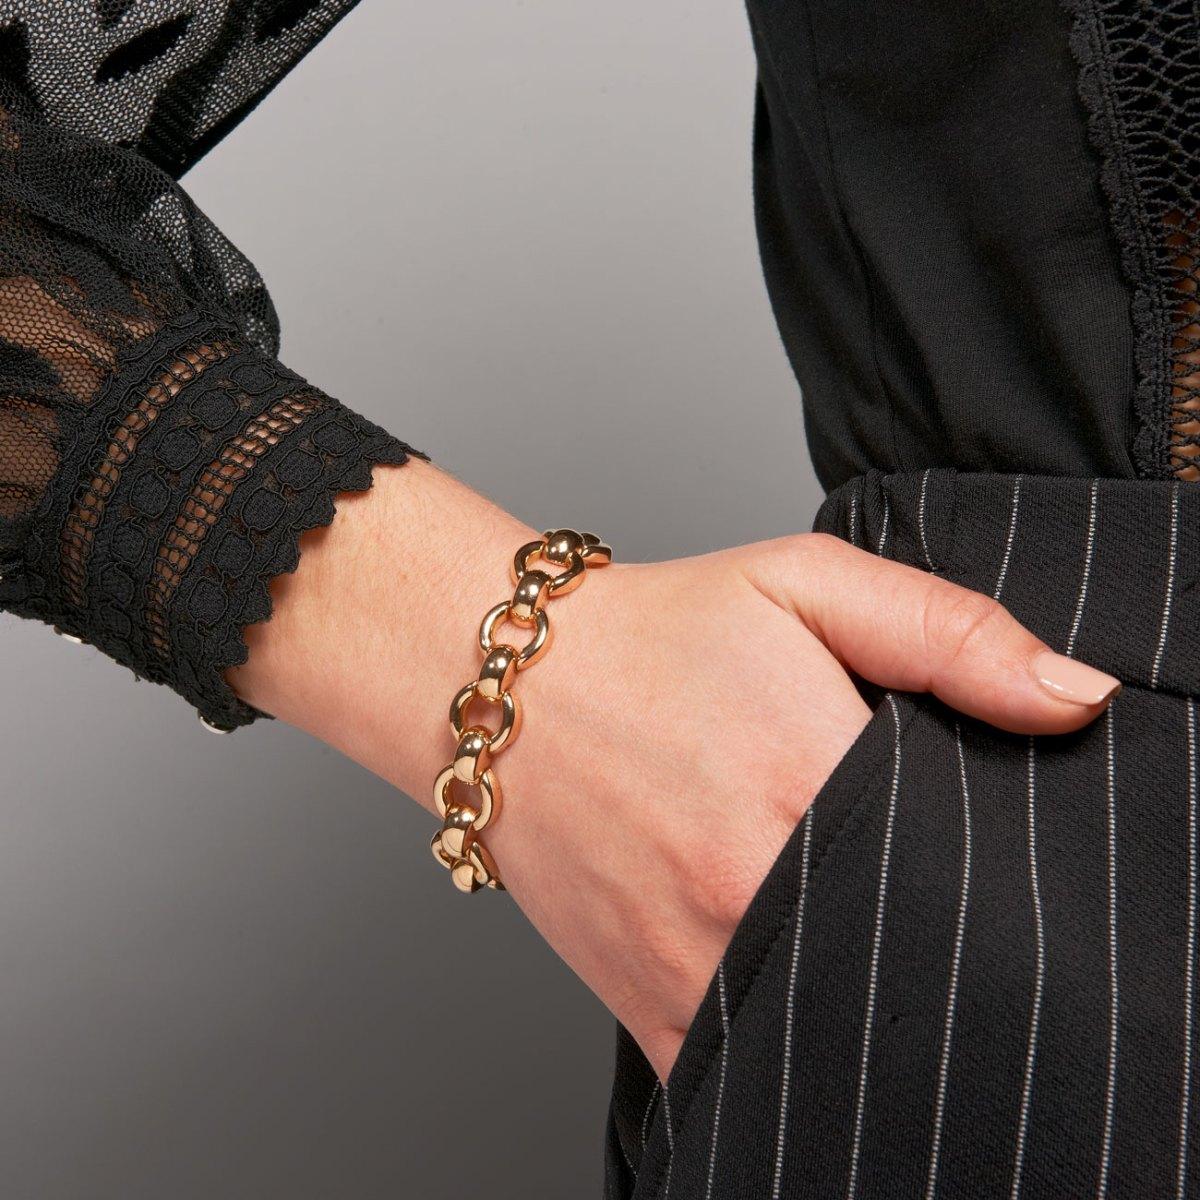 Bracelet or jaune 18K/750, maille Forçat, travail français, poids 26g, réf. BR1901. | EVENOR Joaillerie • France